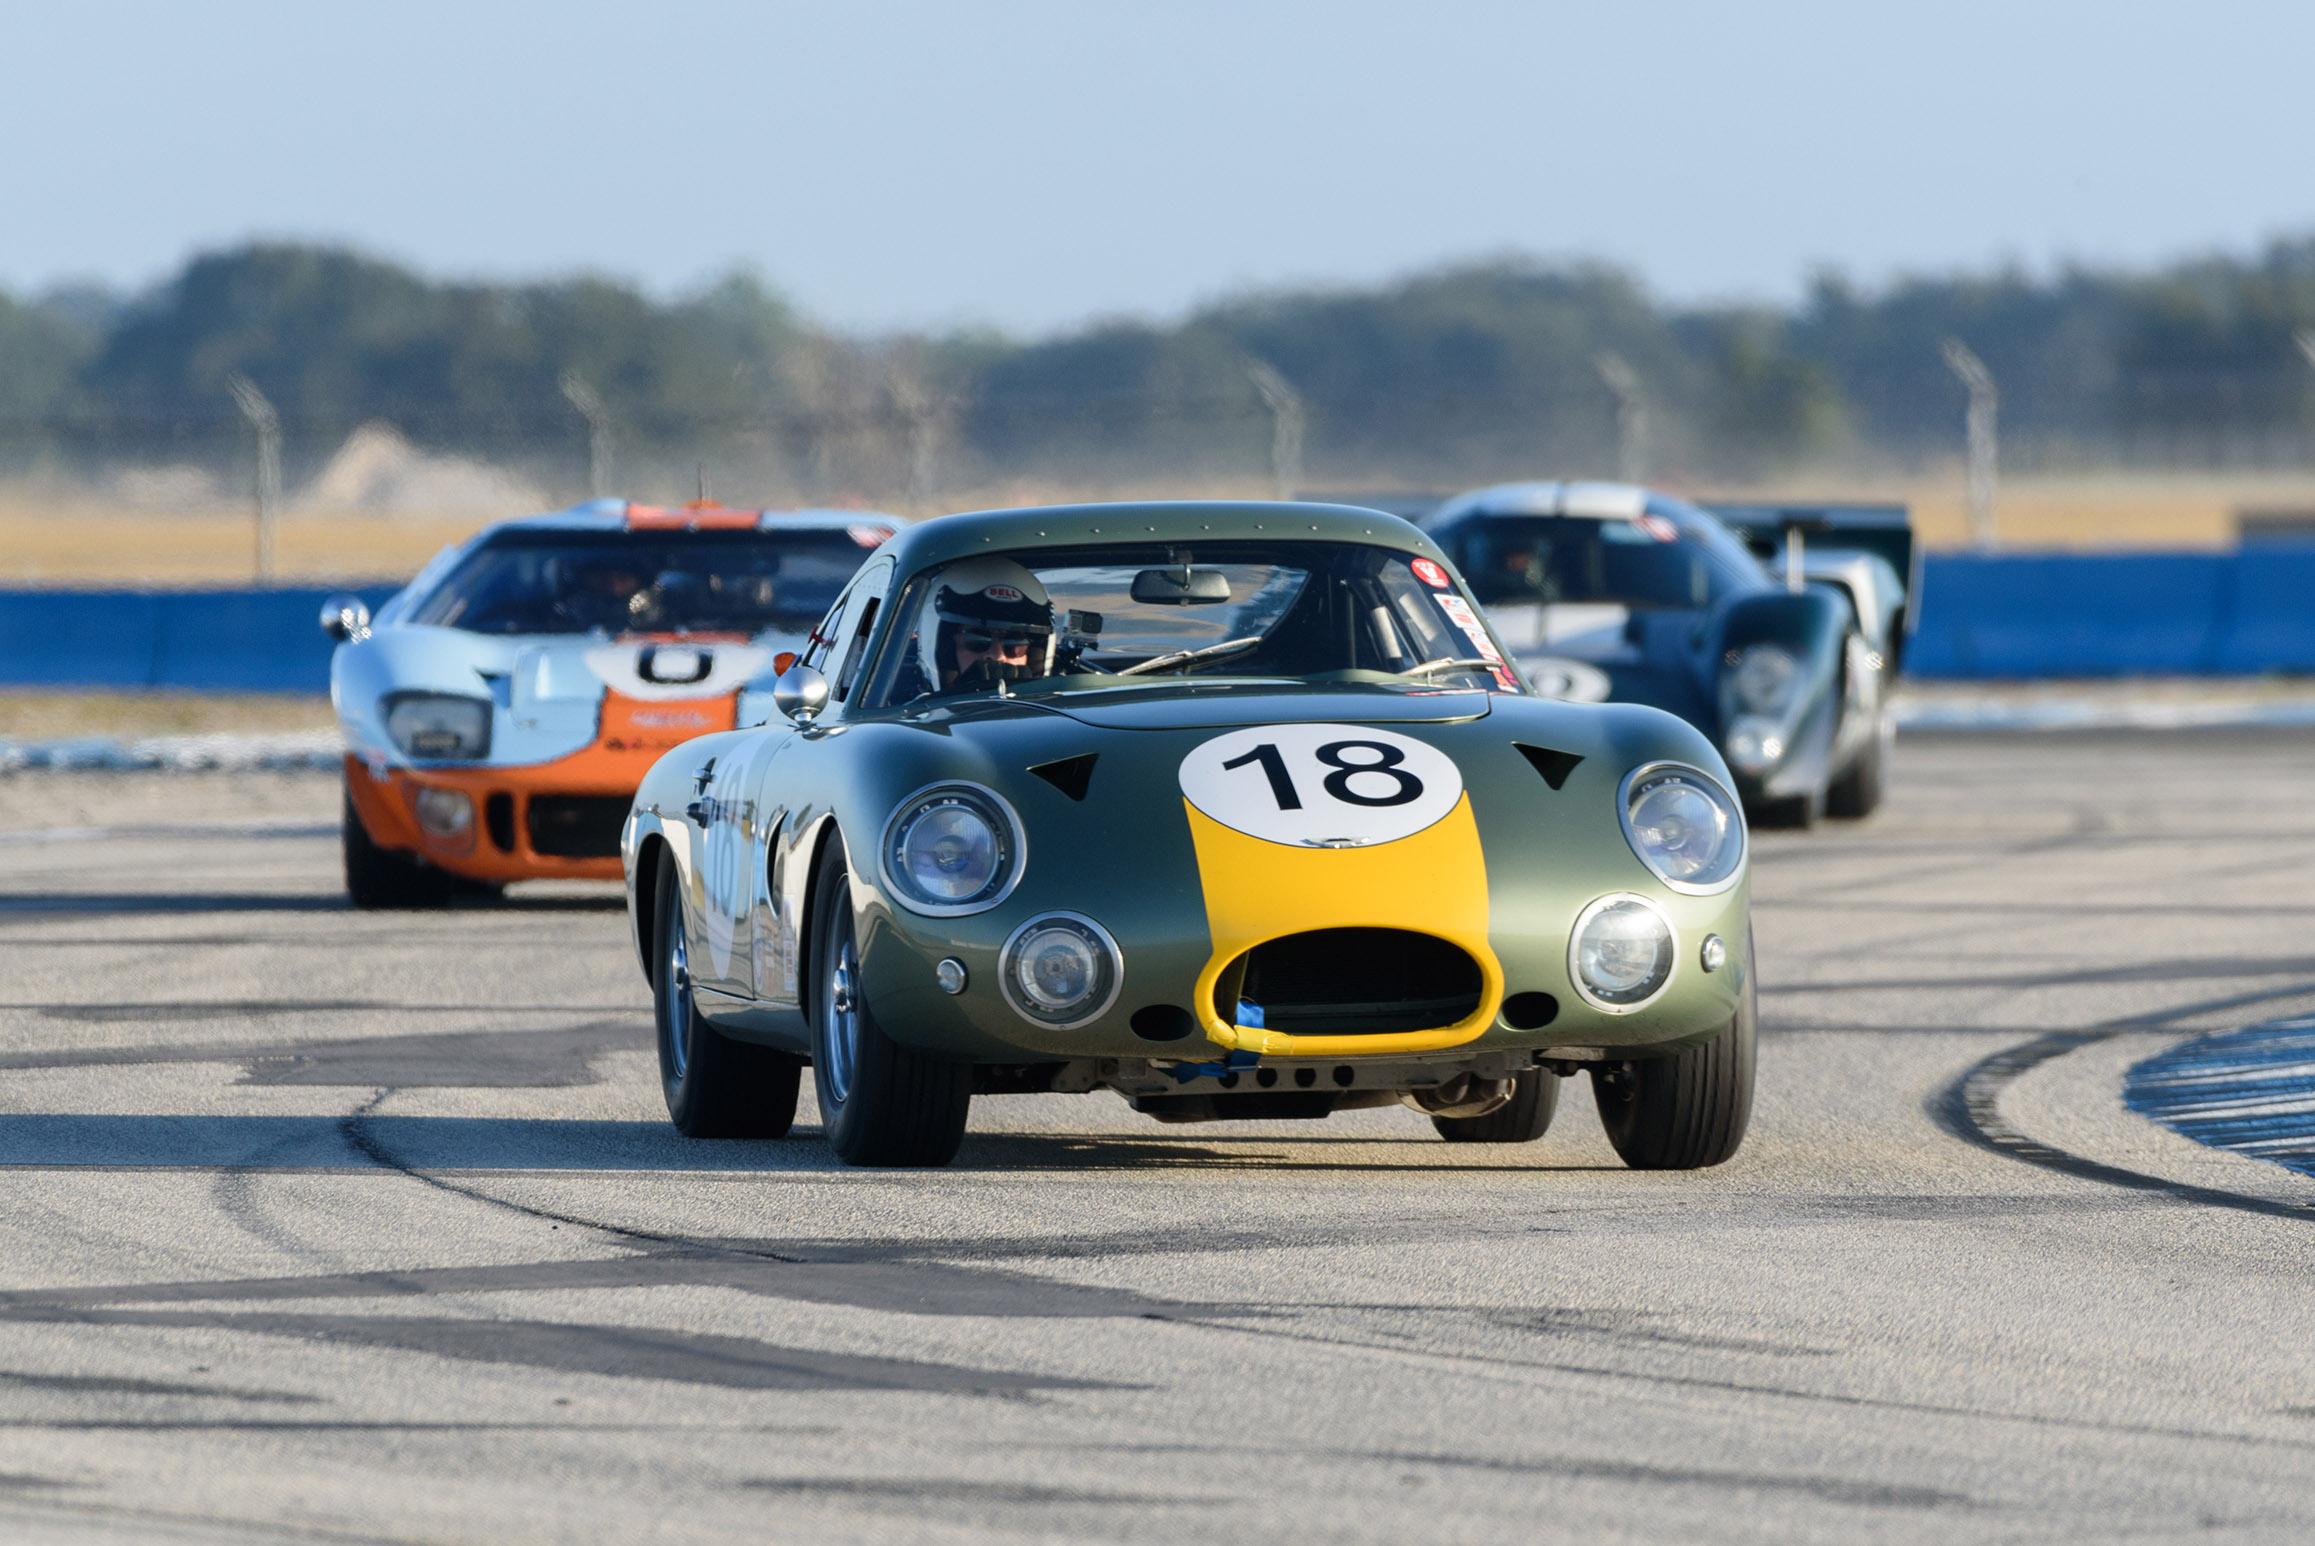 Rewriting History – Aston Martin DP214